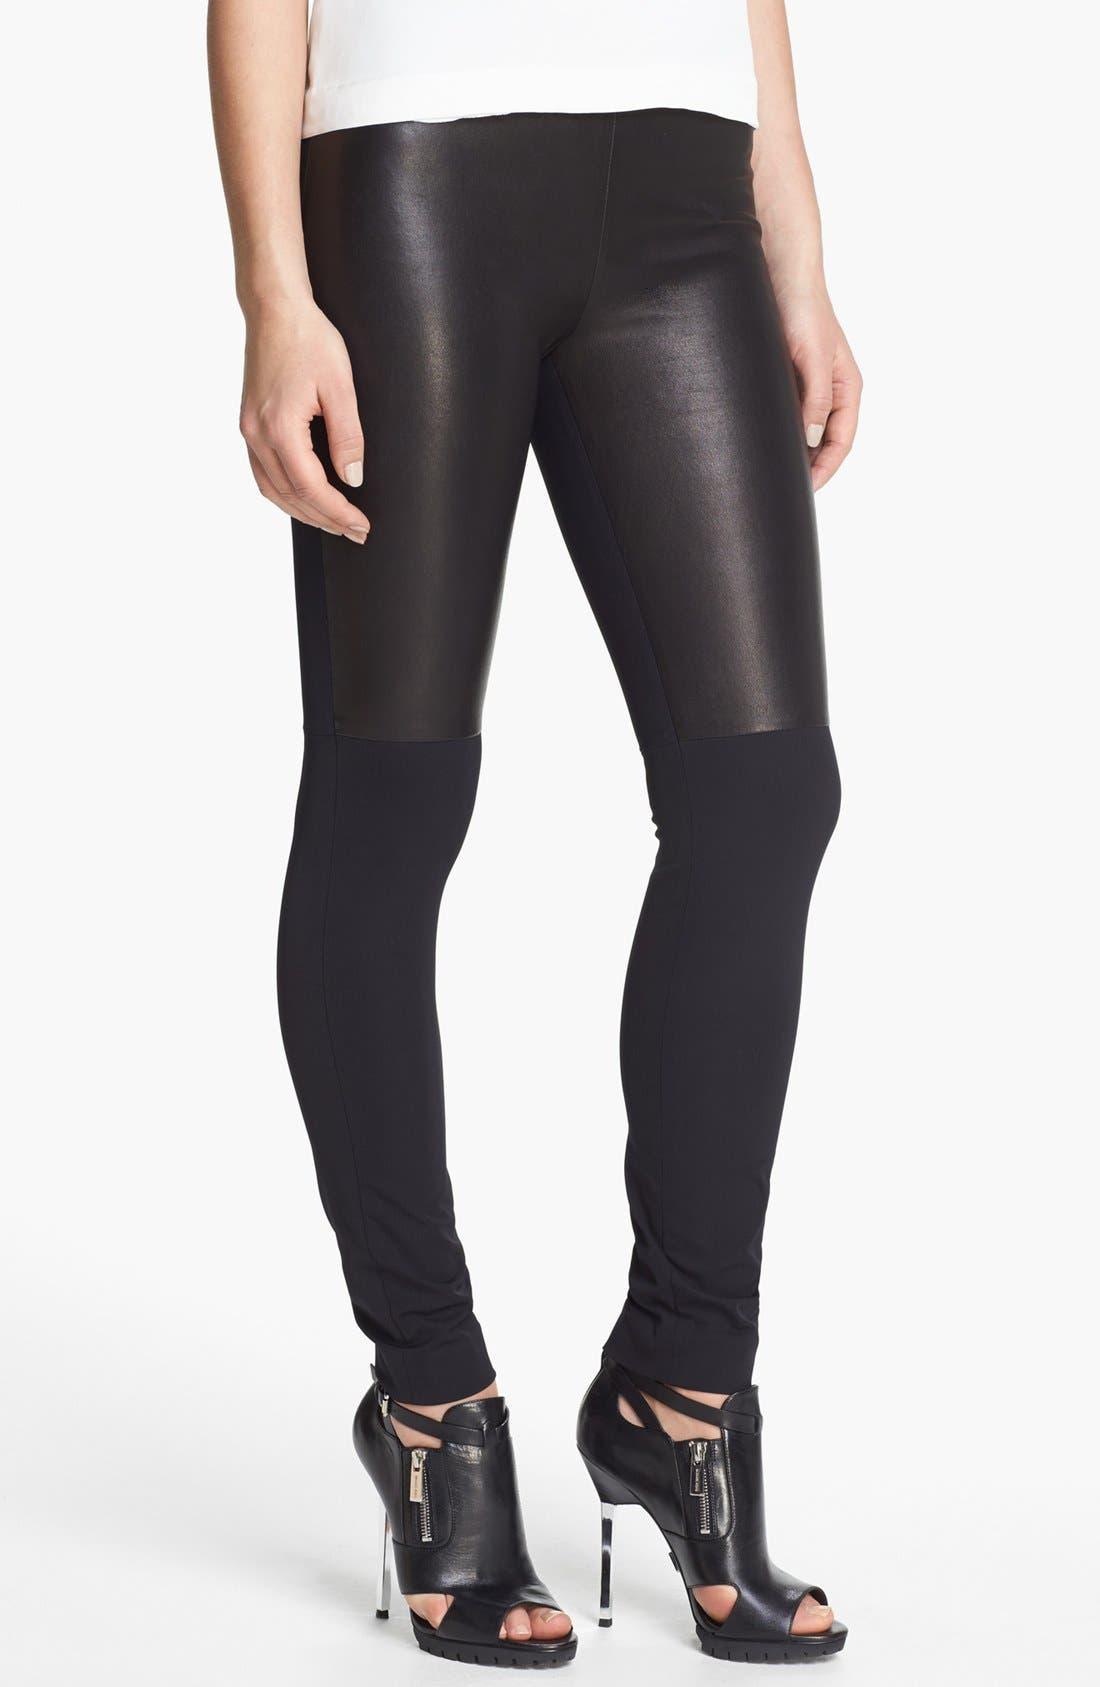 Main Image - Milly 'Bri' Leather Panel Leggings